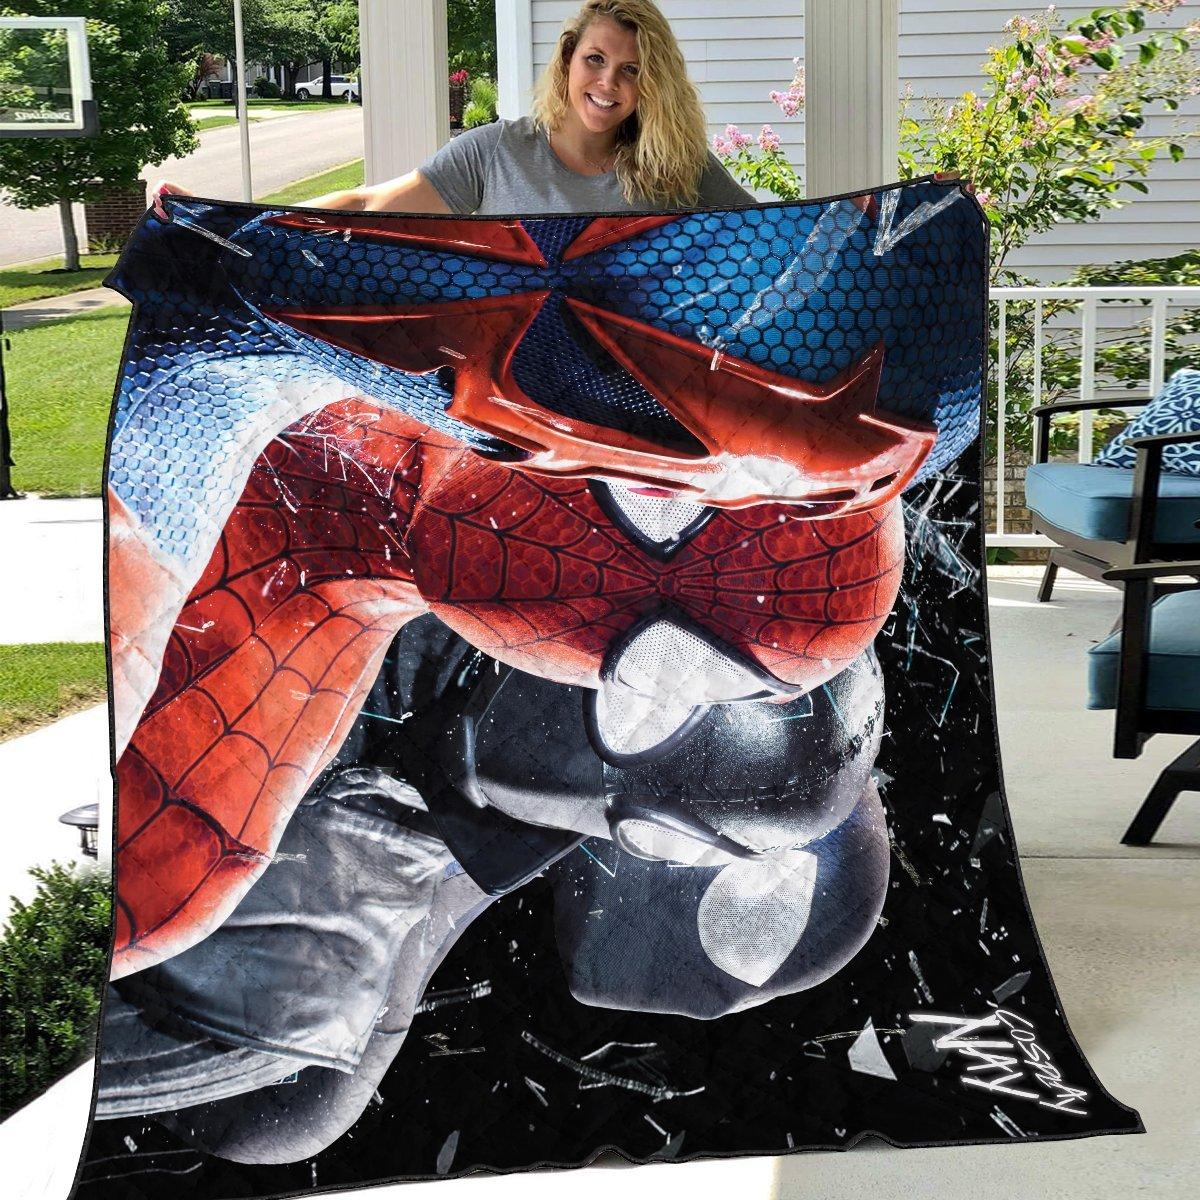 multiverse spider man signed quilt blanket 611257 - Otaku Treat